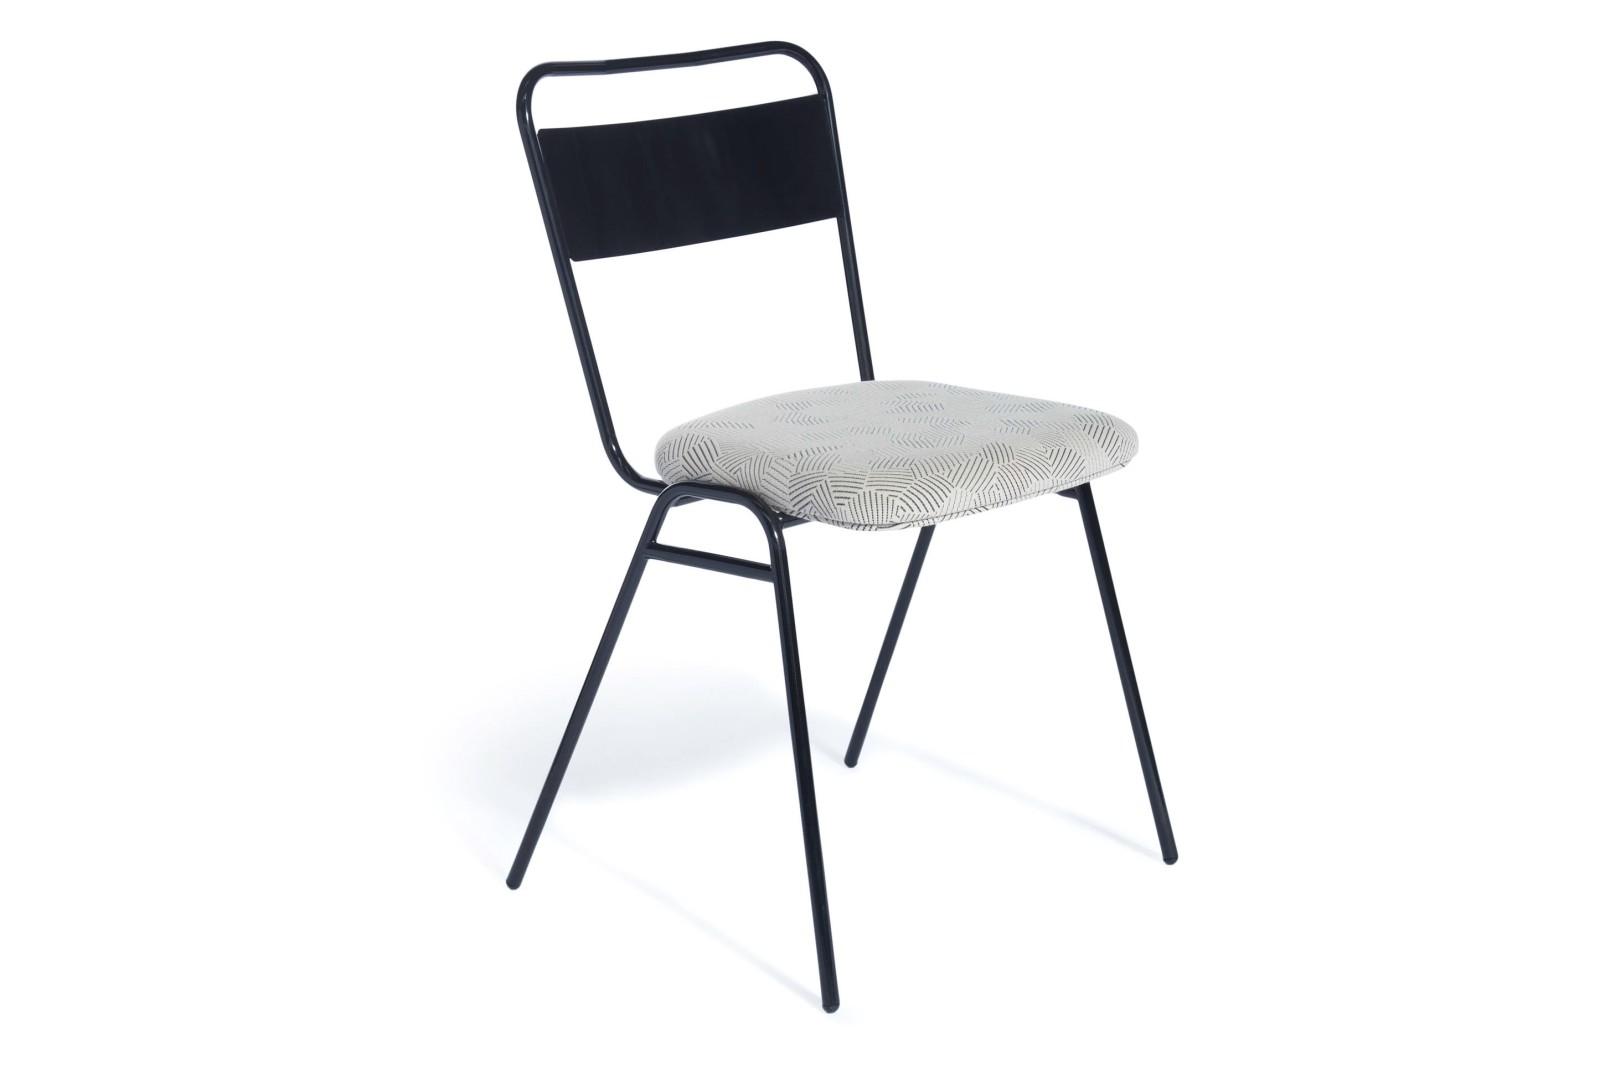 Working Girl Soft Dining Chair Rivet Tensile EGL20, Jet Black - RAL 9005